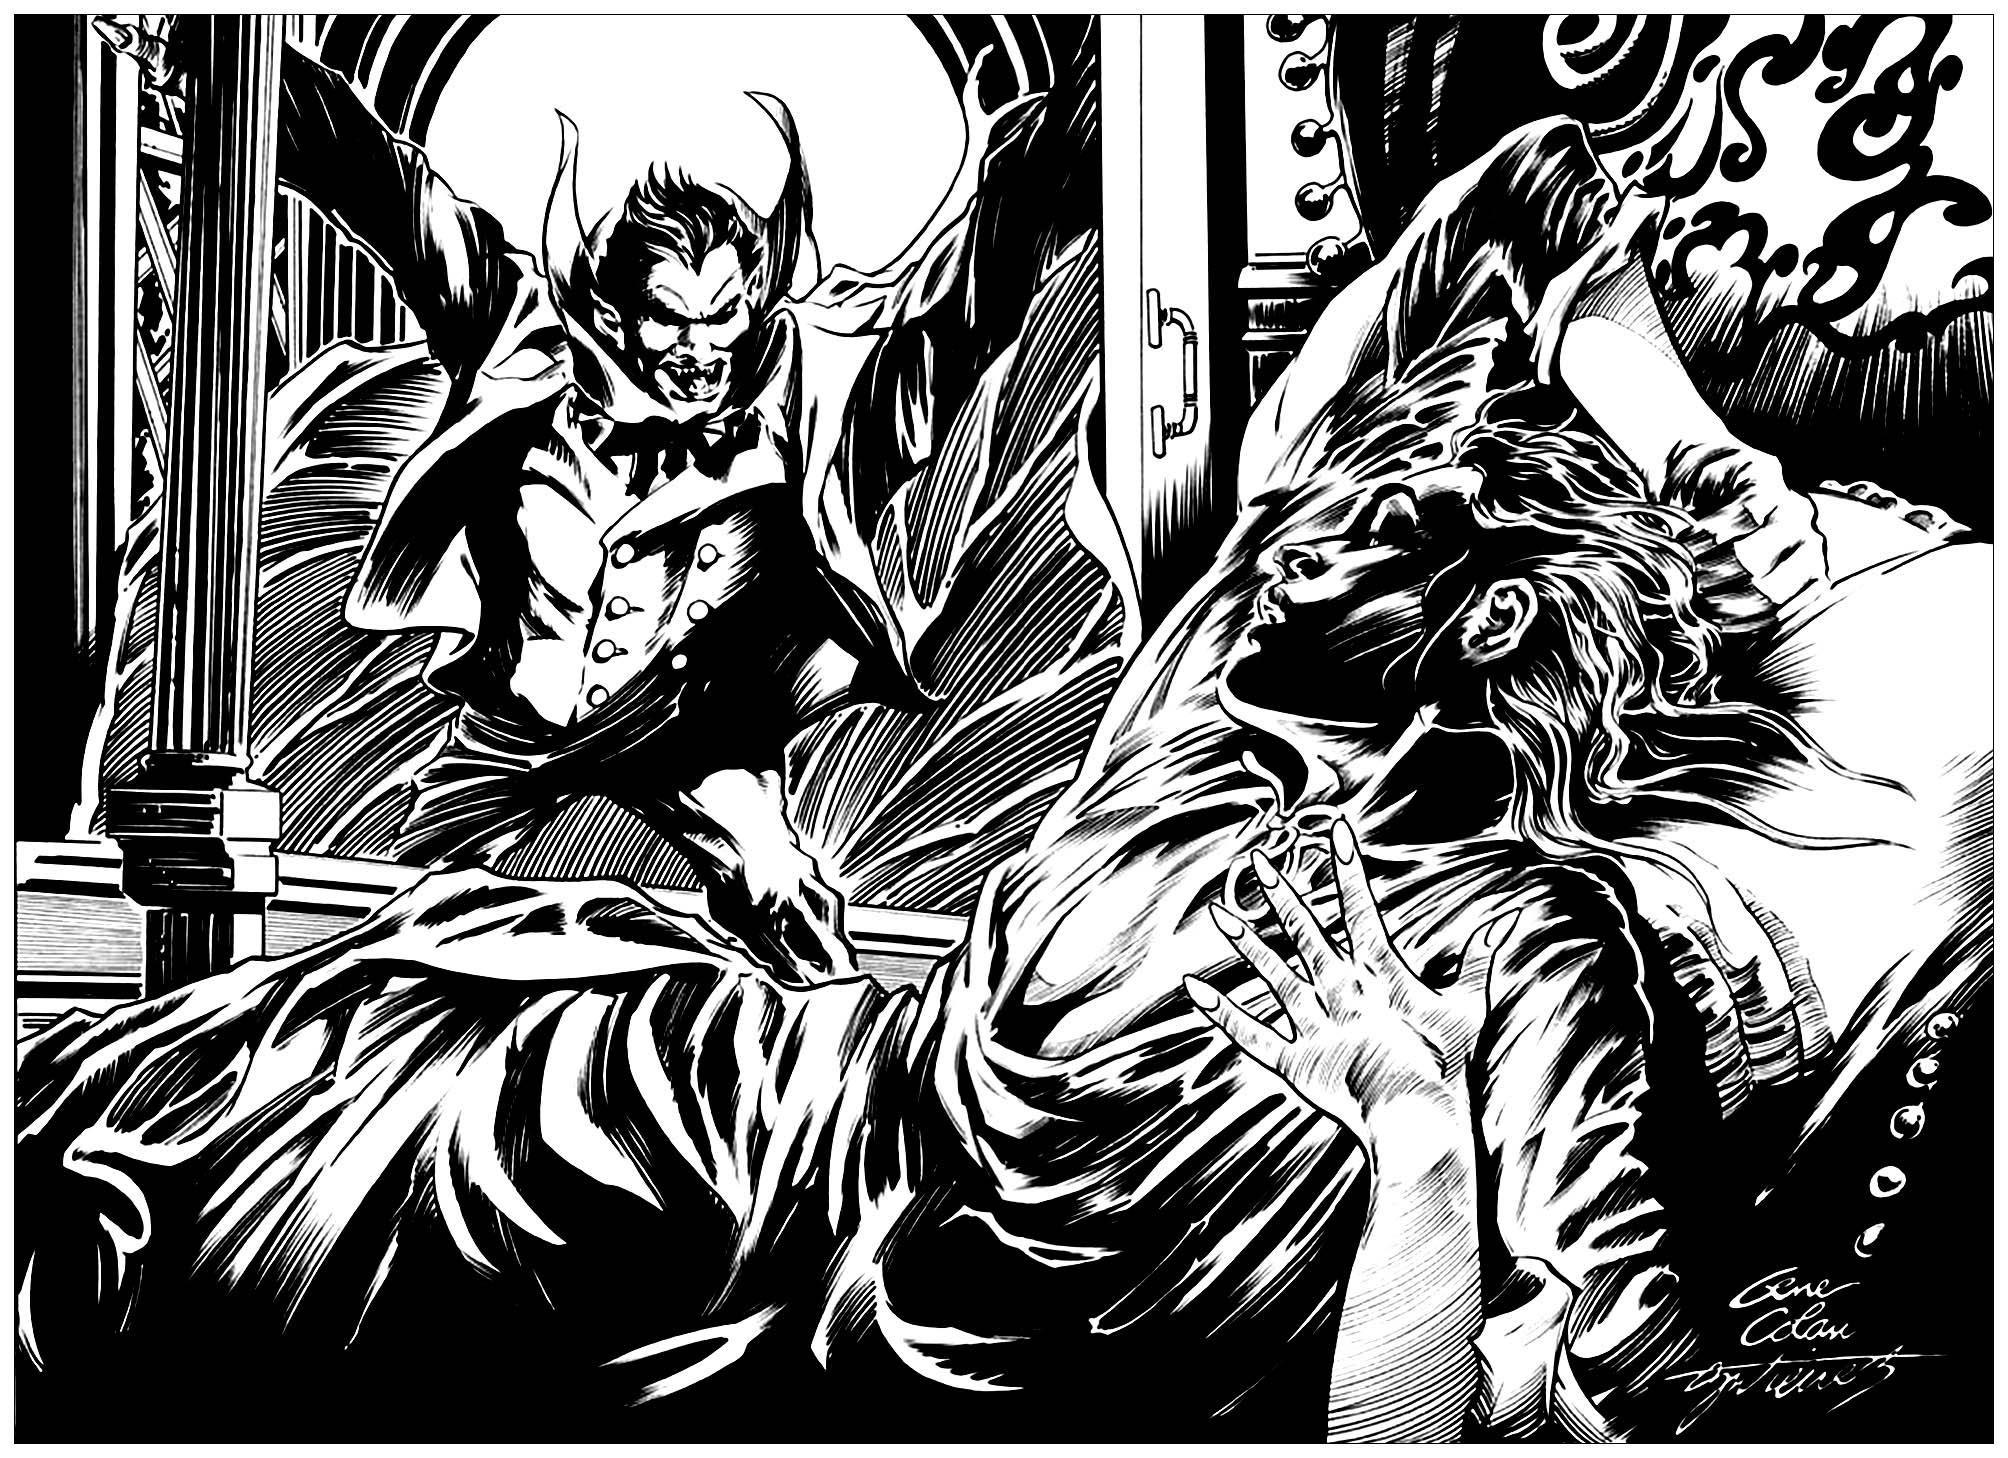 Dracula illustration